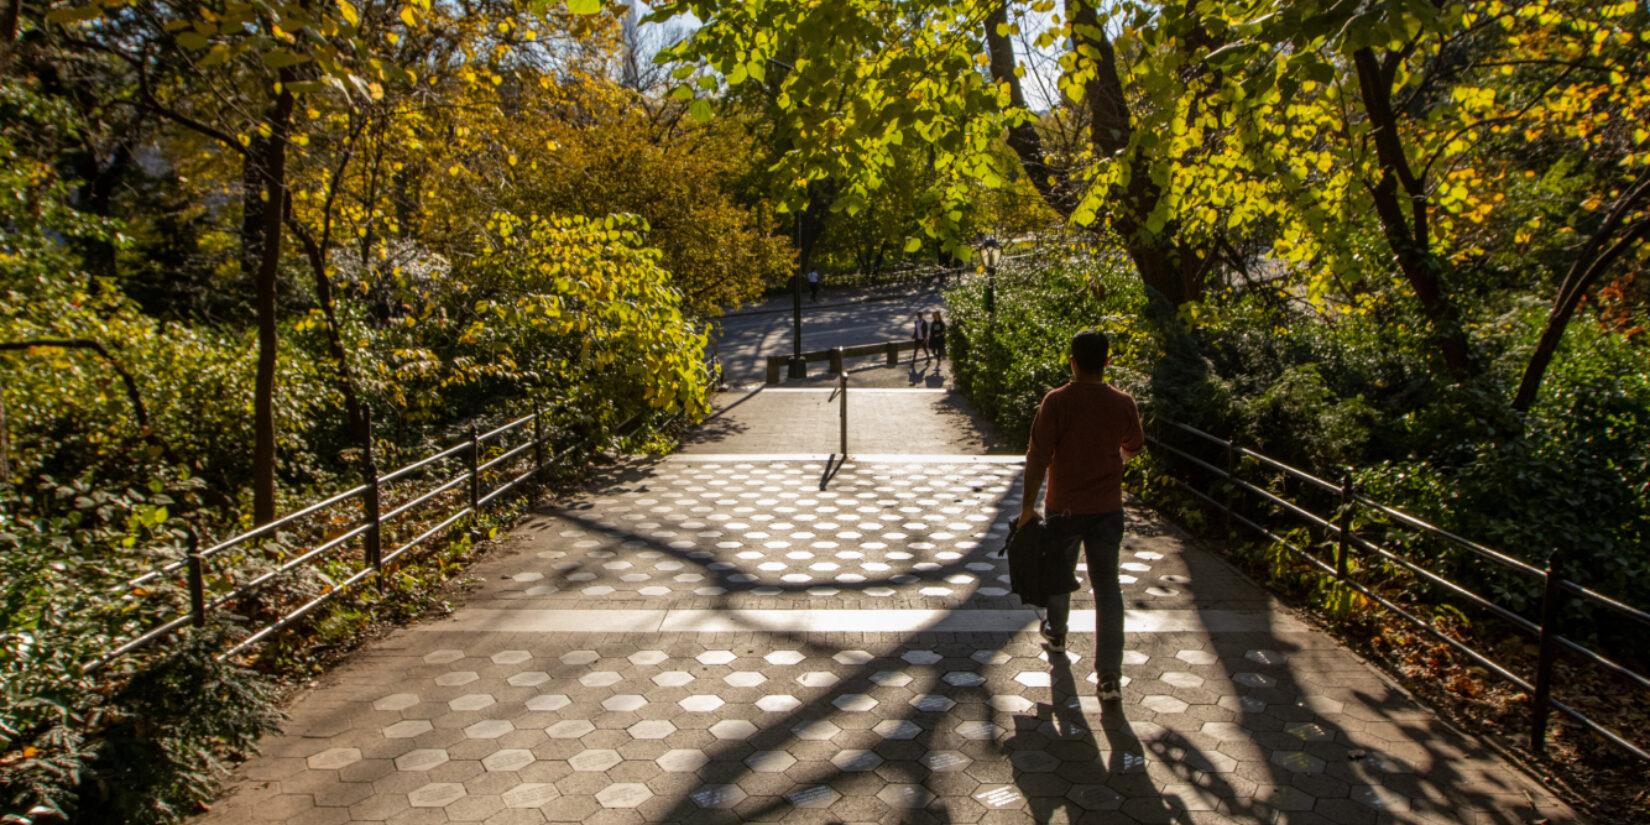 A pedestrian on Gilder Run, hidden in the long shadows of the setting sun